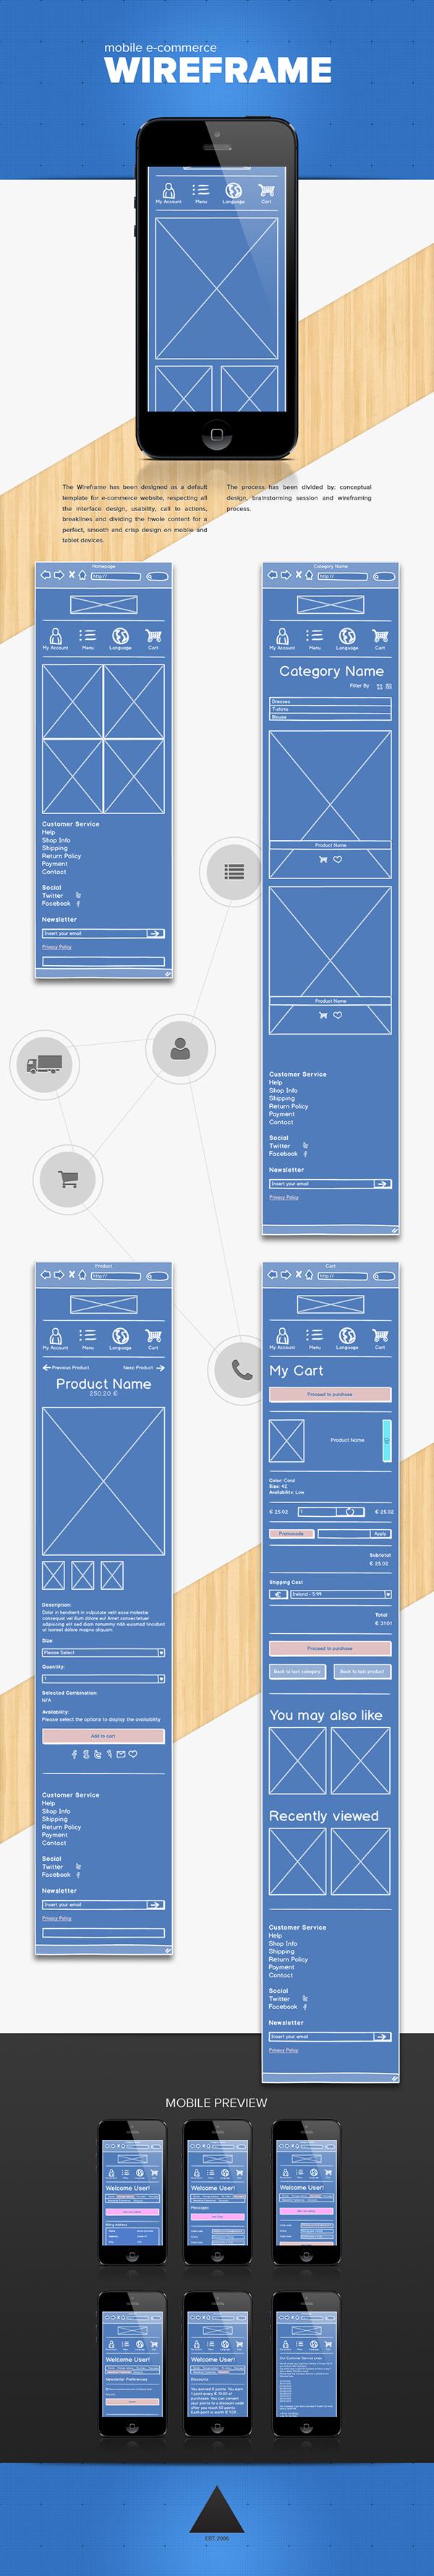 e-commerce e-shop commerce wireframe ux UI Interface shop Responsive mobile